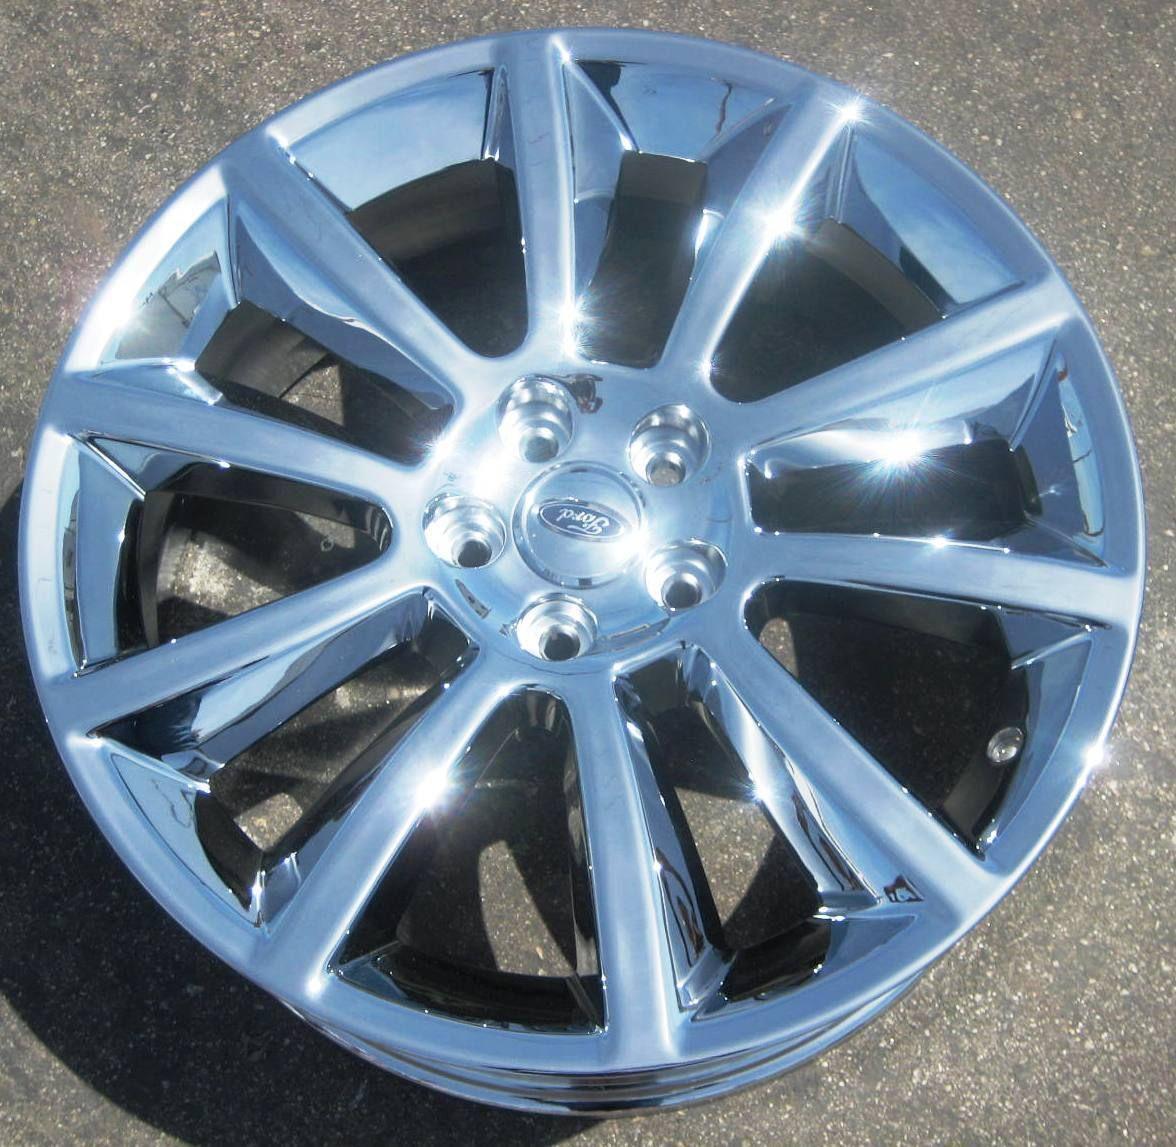 New 20 Factory Ford Flex Chrome Wheels Rims 2009 2012 Set of 4